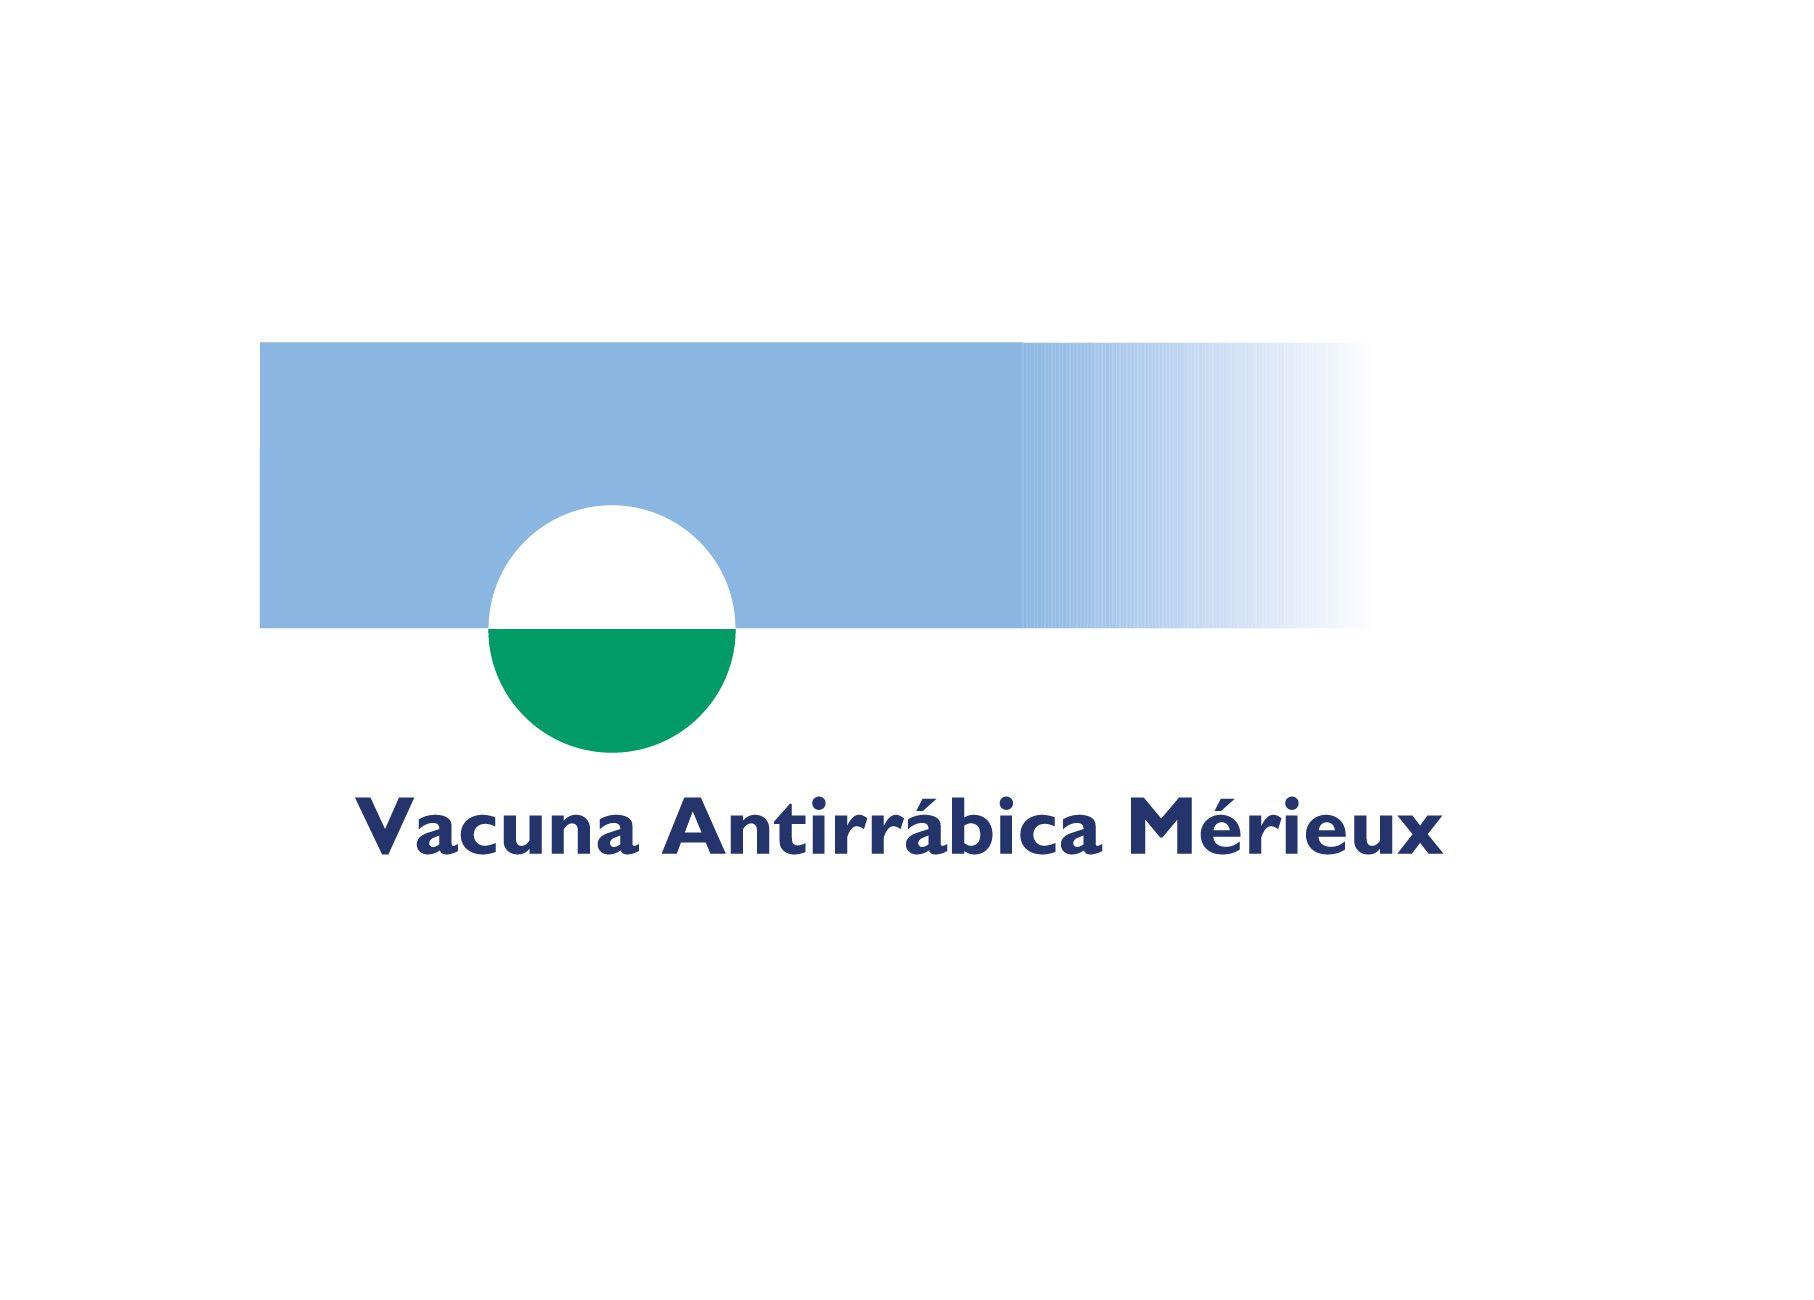 Vacuna Antirábica Merieux